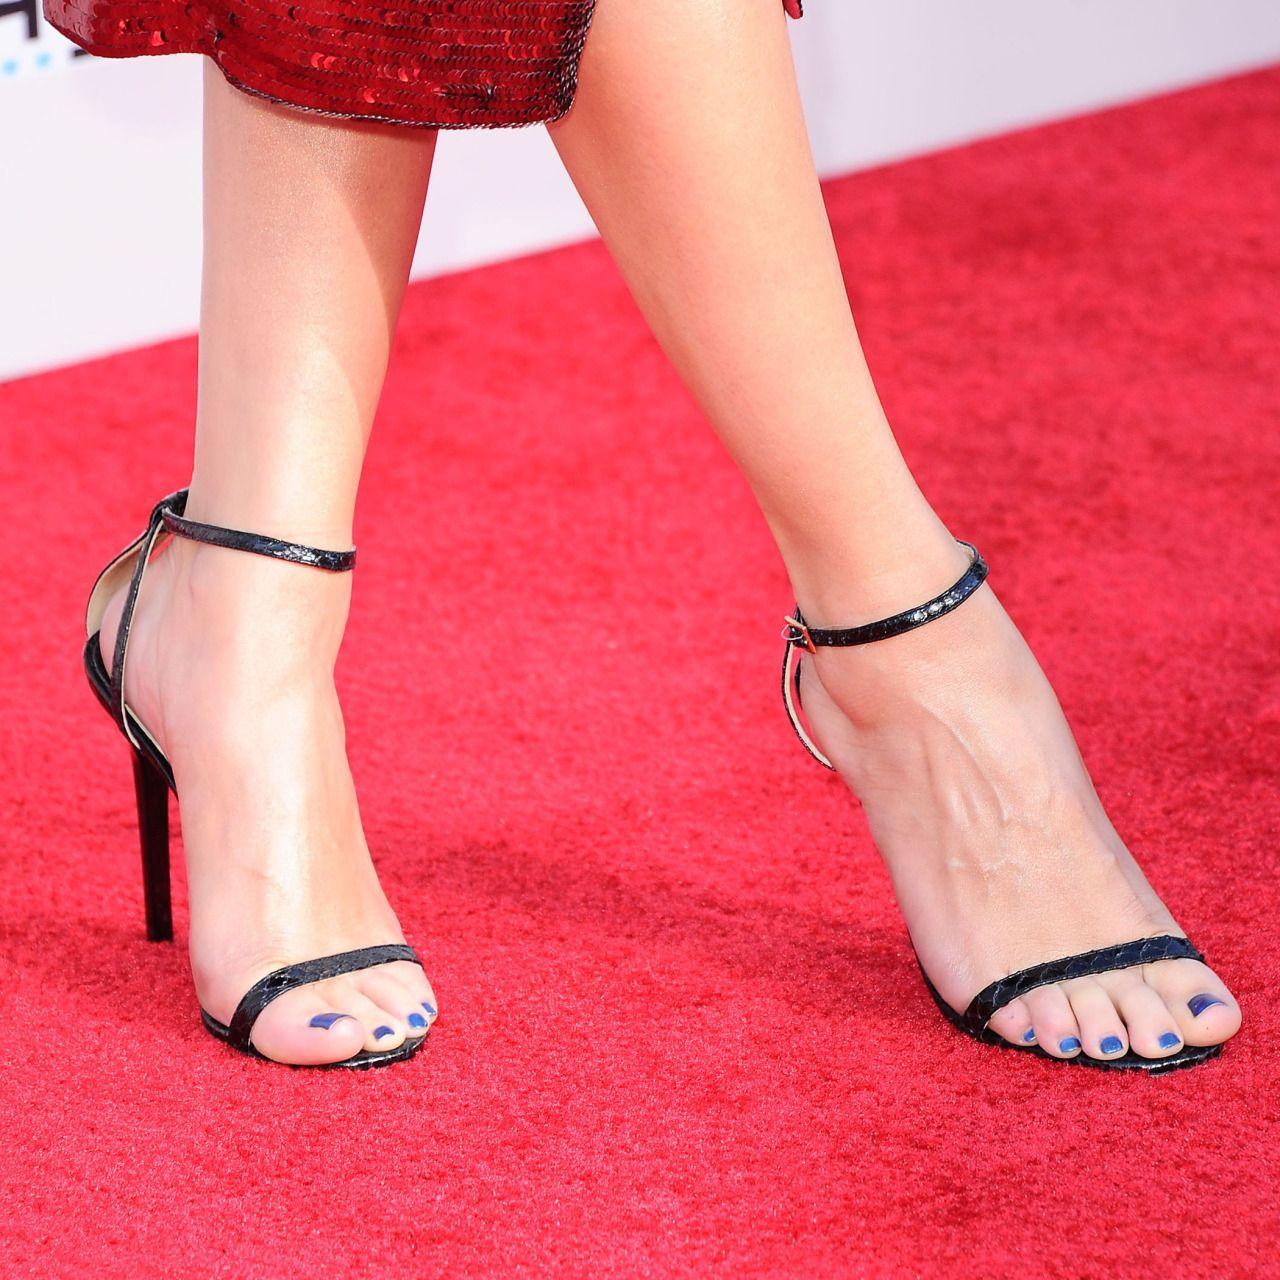 Sexy Damen Füße Bilder